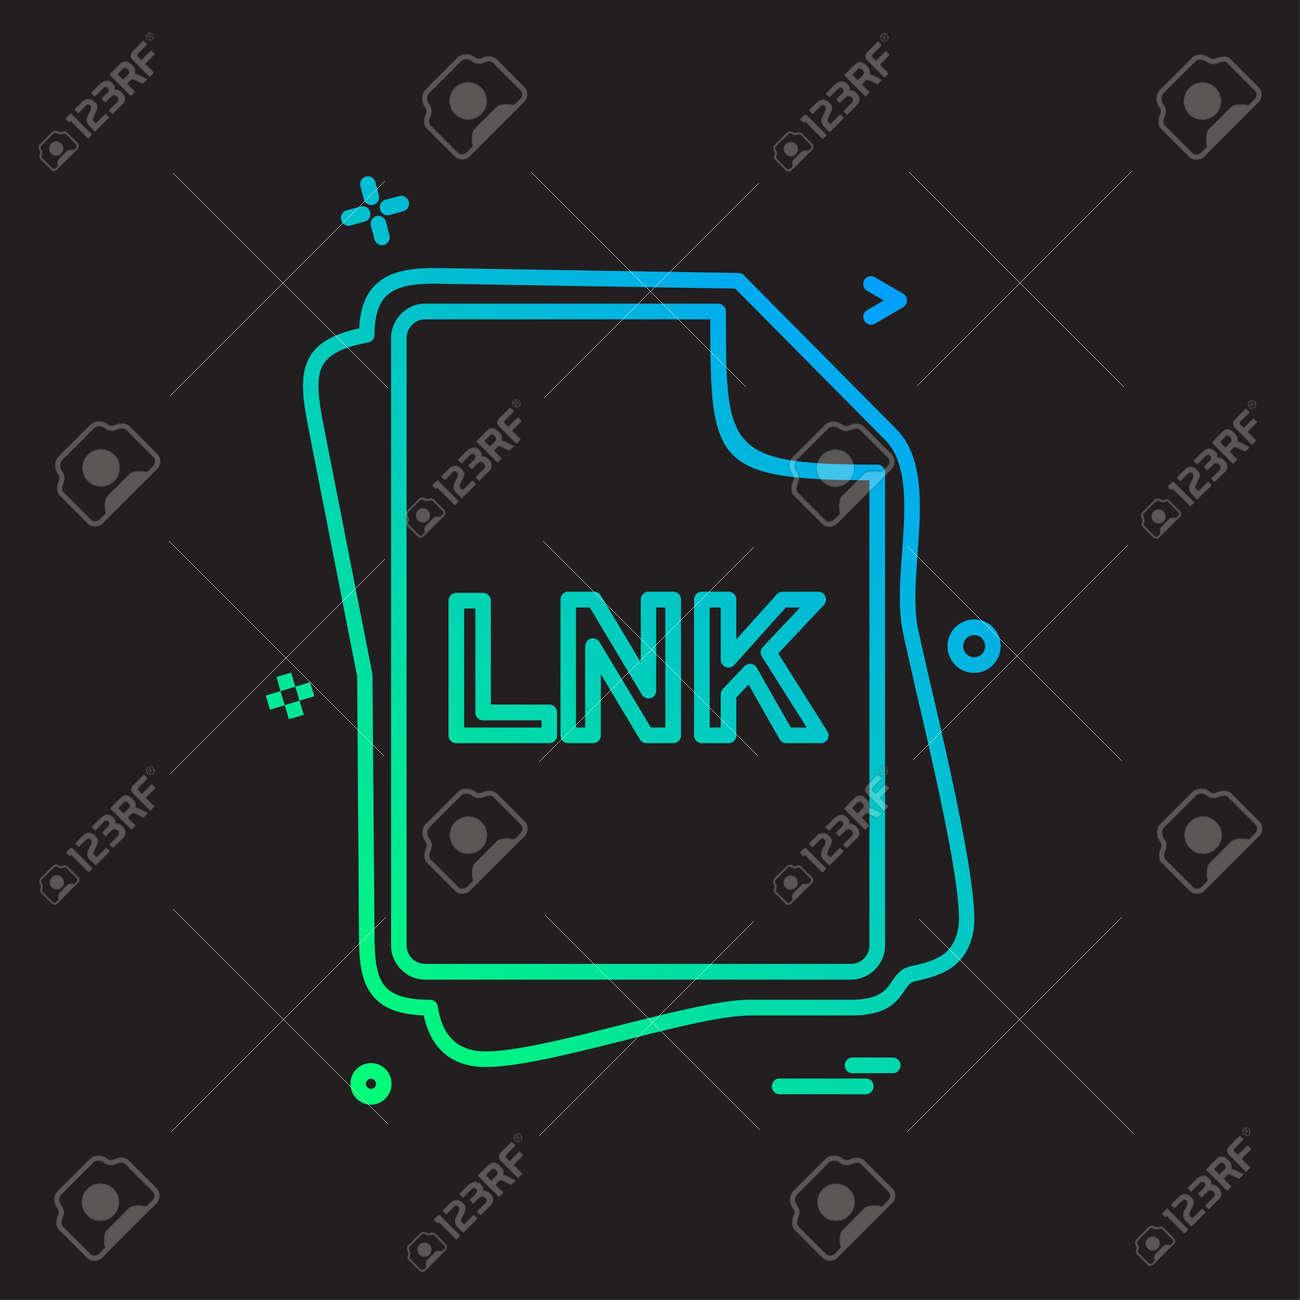 LNK file type icon design vector - 118252659